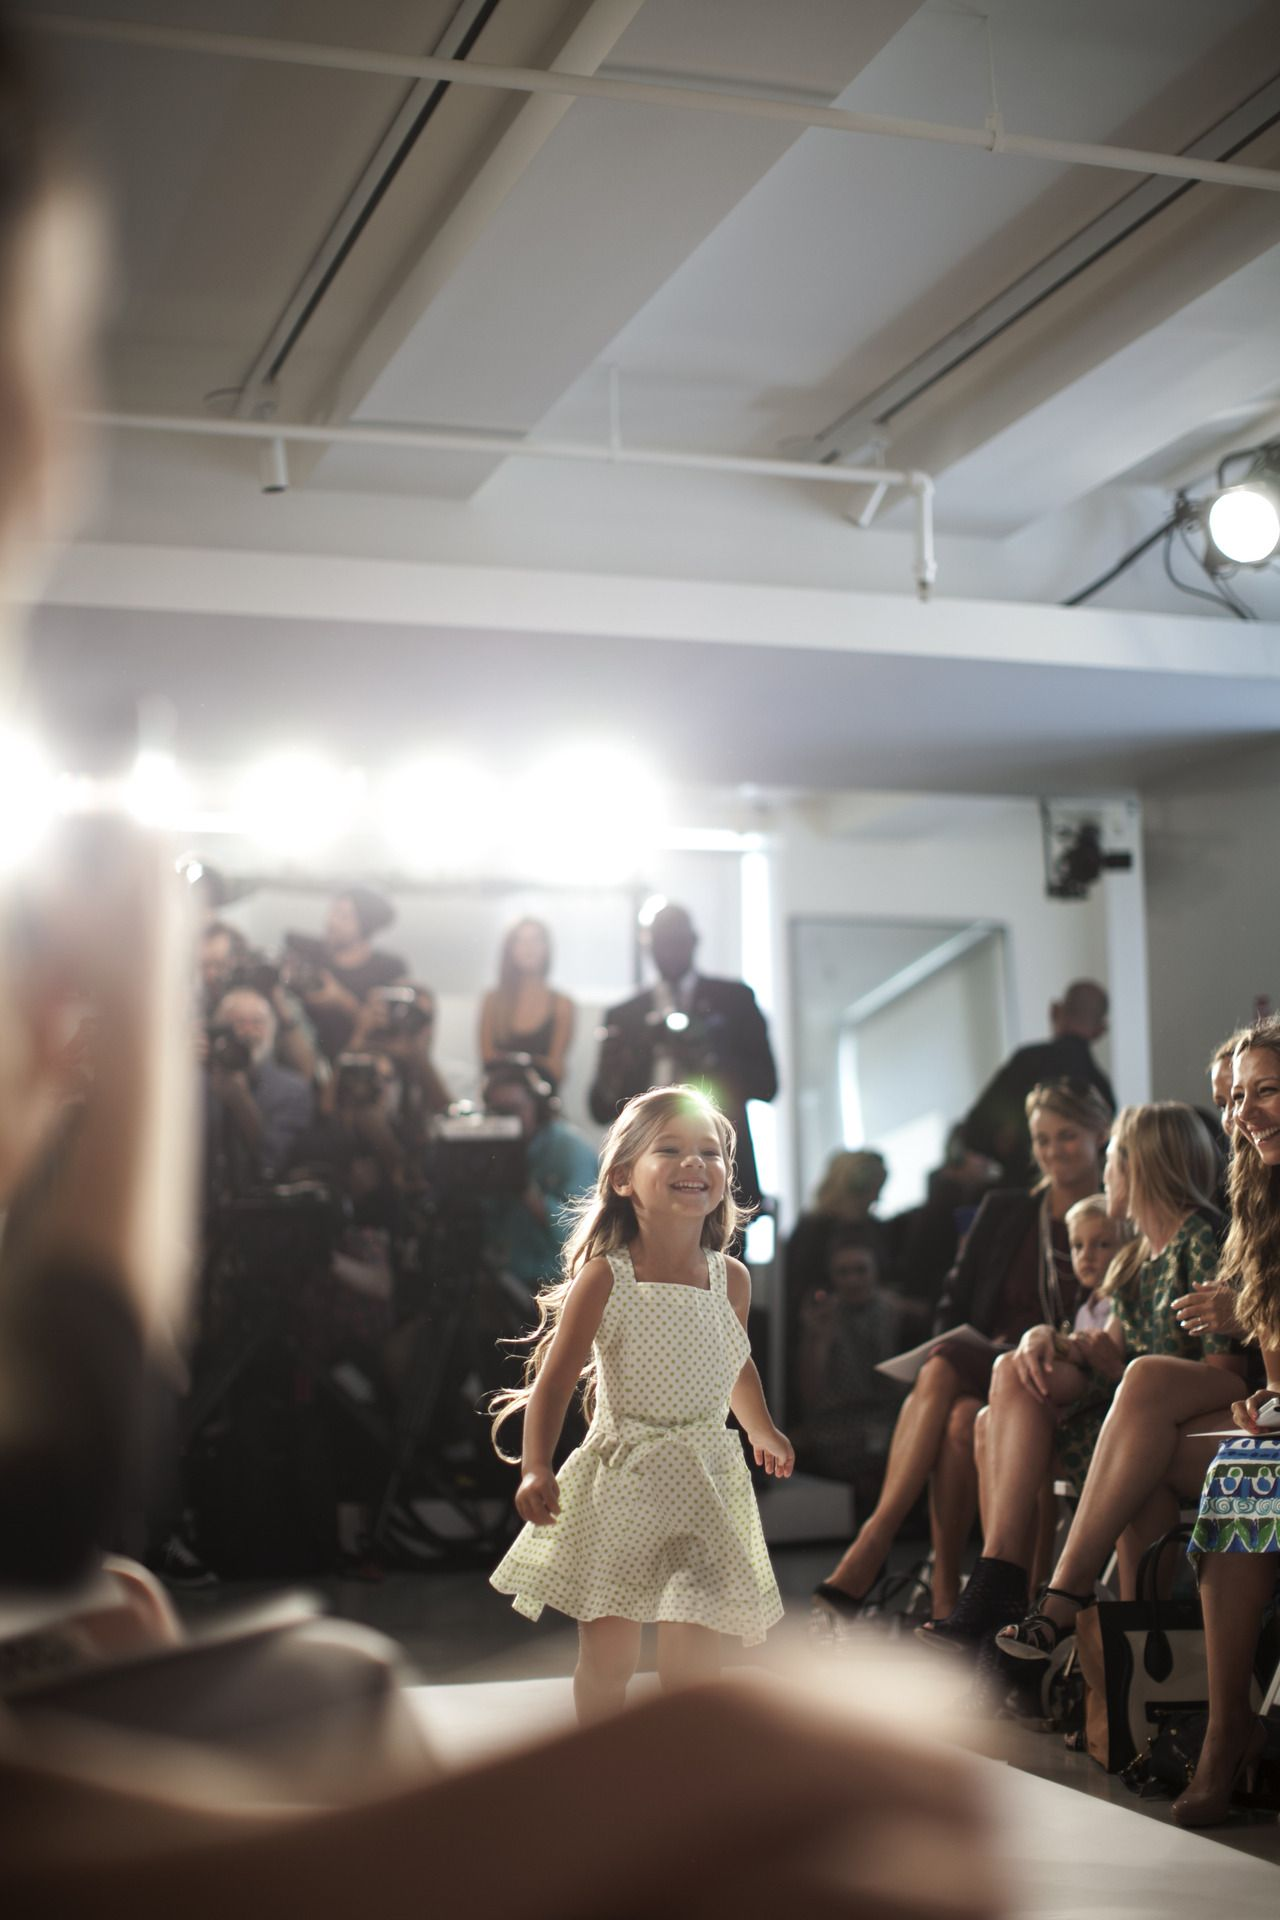 Oscar de la Renta Children's Wear 2013 Runway Show, New York Fashion Week